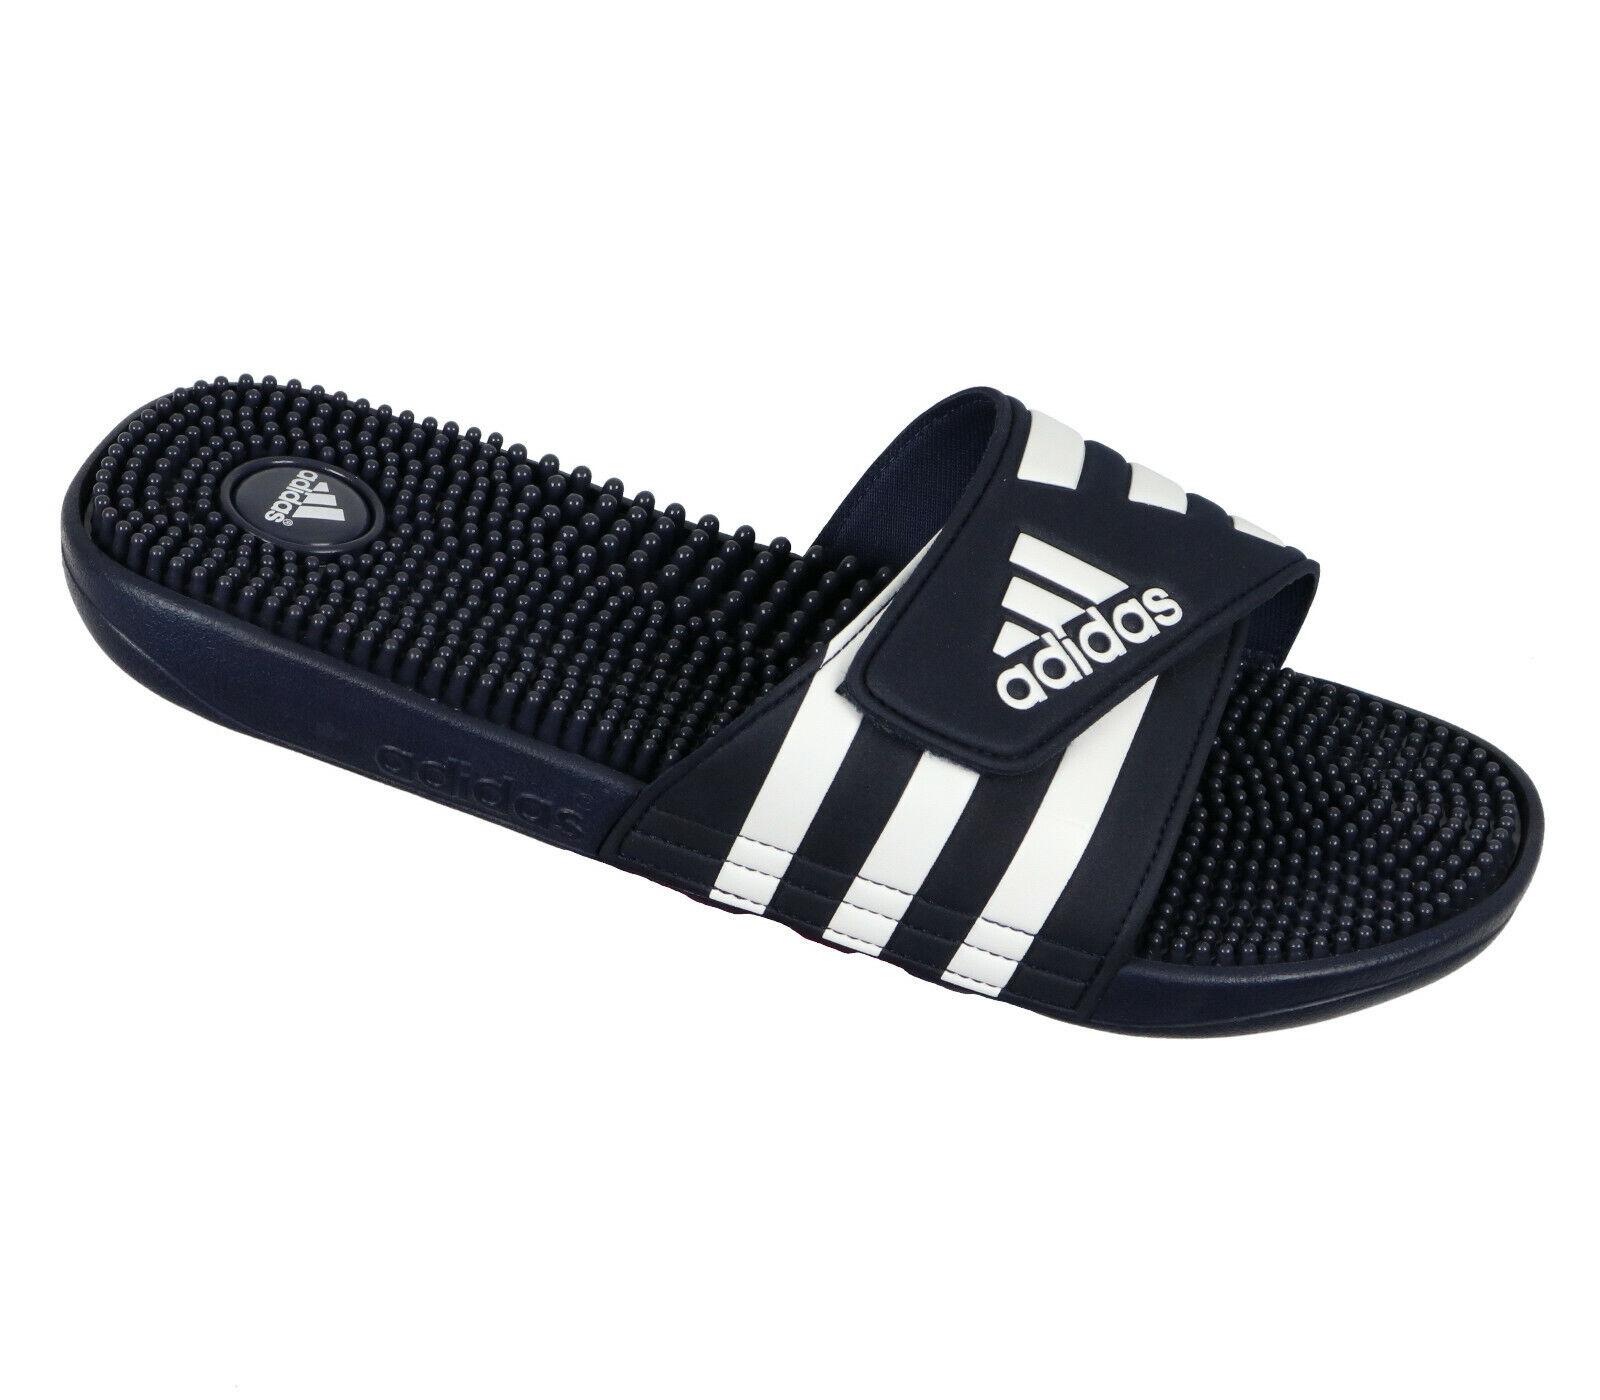 Adidas Adissage Slide Seali Sz 12 Blu Navy Bianco Massaggio Recupero